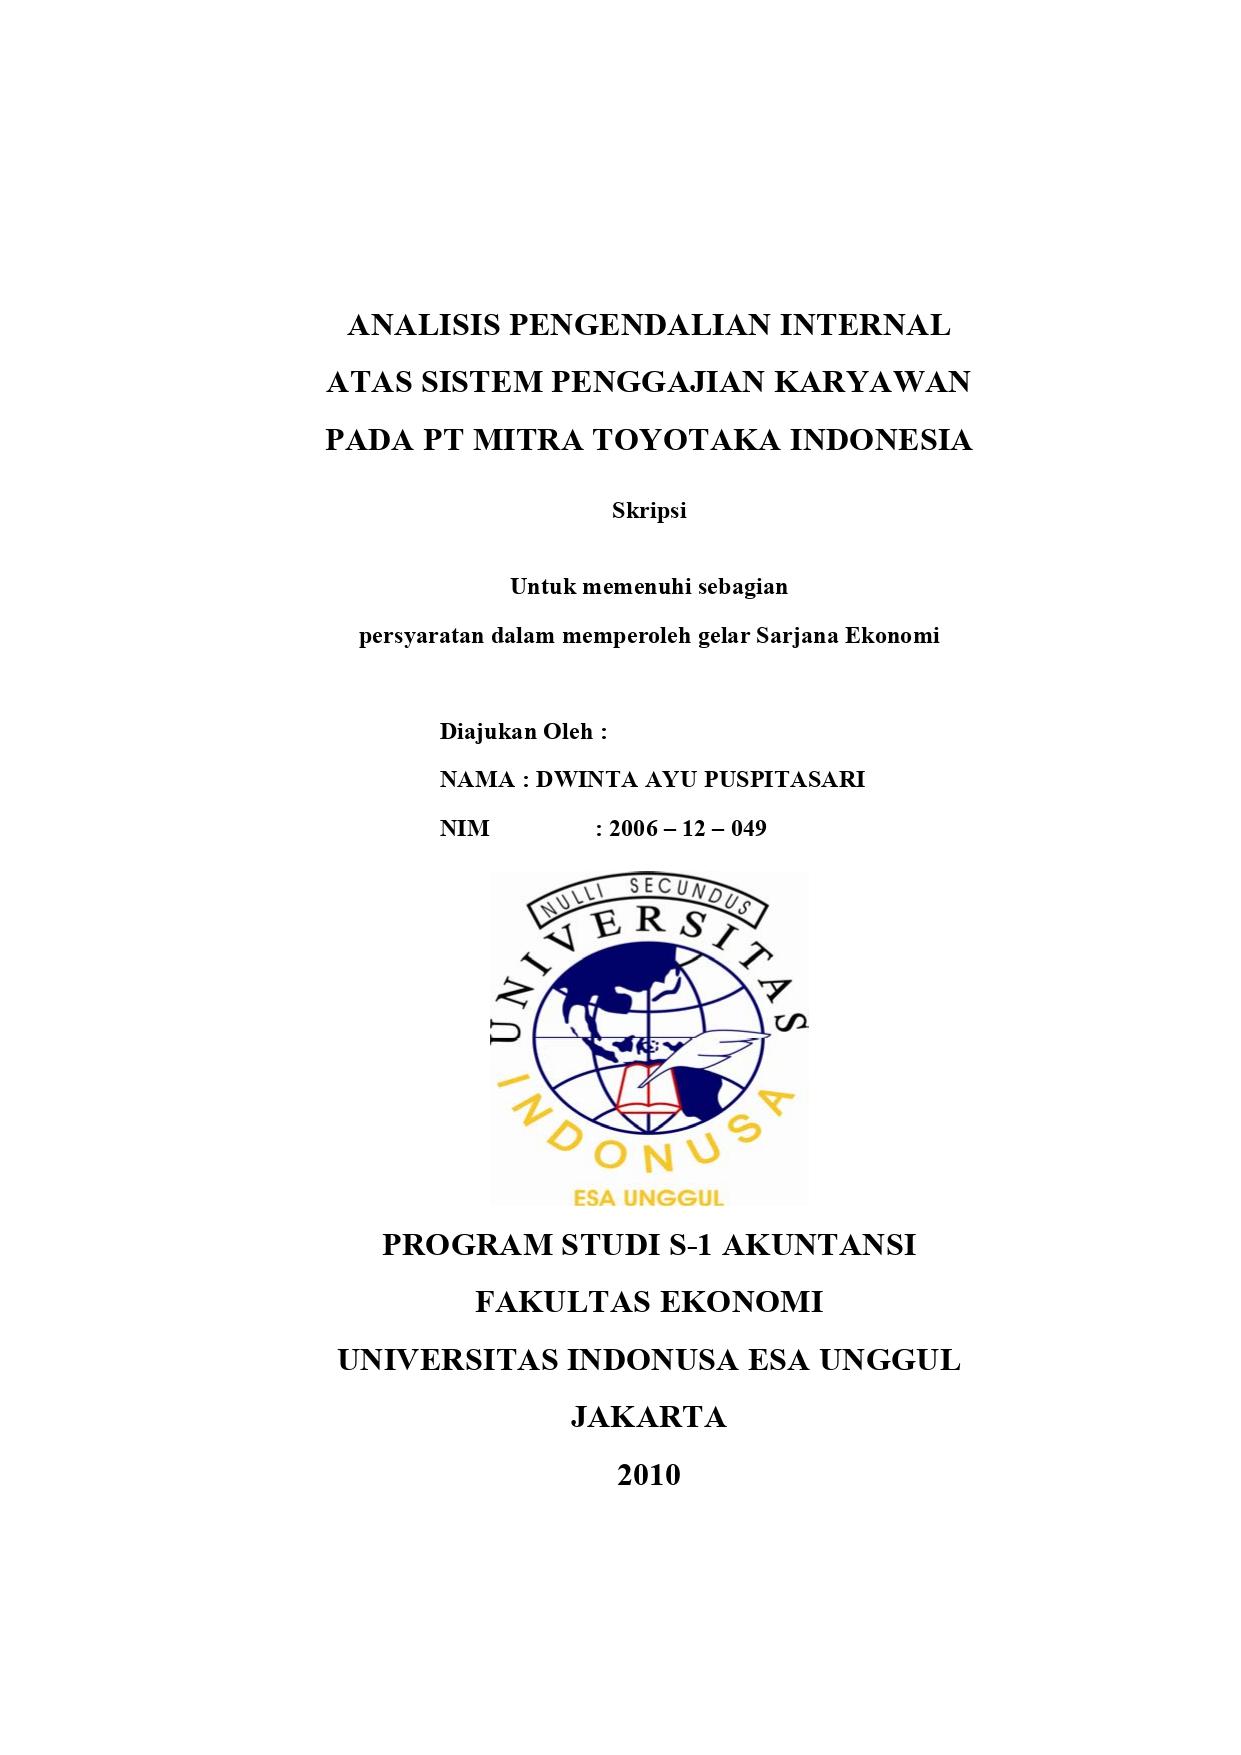 Analis Pengendalian Internal Atas Sistem Penggajian Karyawan pada PT Mitra Toyotaka Indonesia